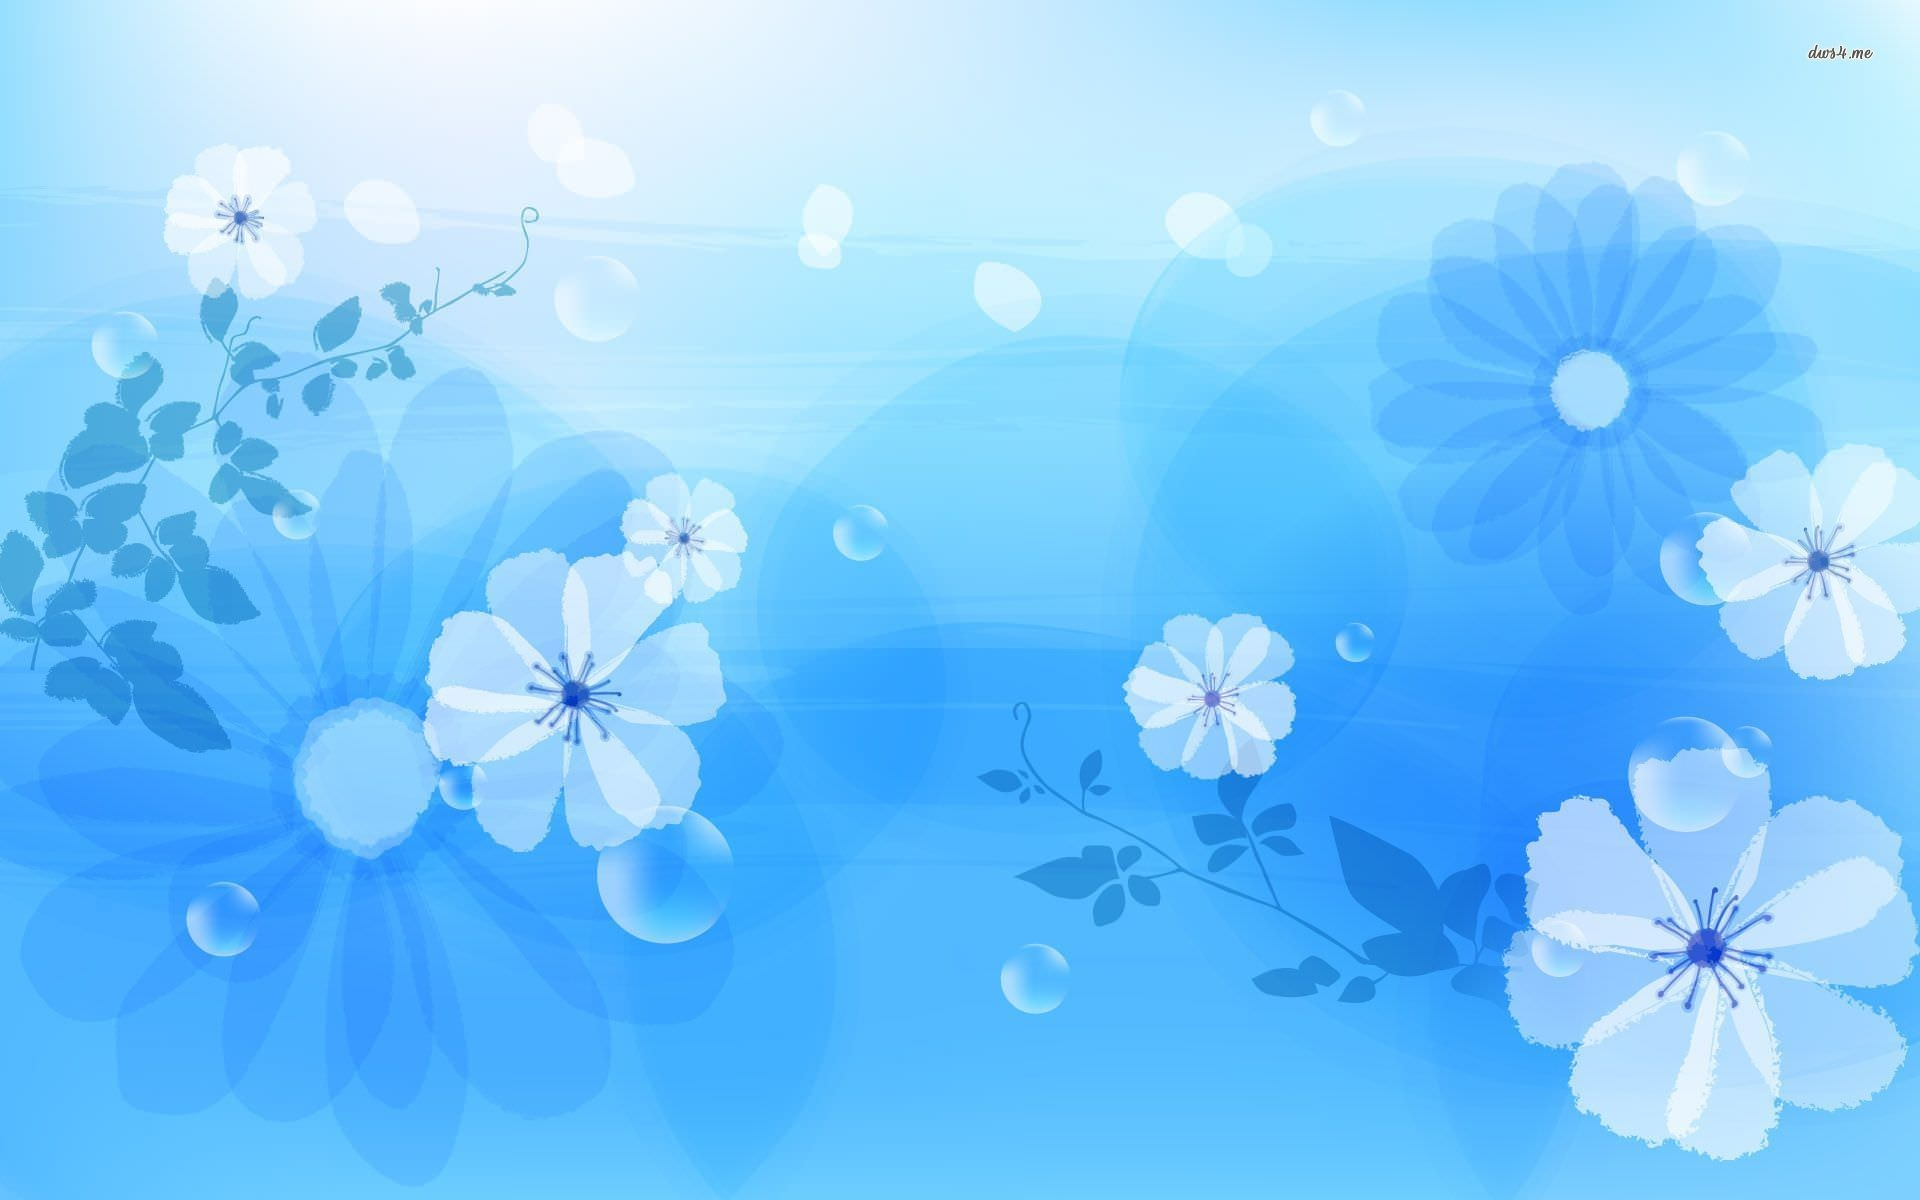 Blue Floral Wallpaper - Blue Flowers Wallpaper For Desktop